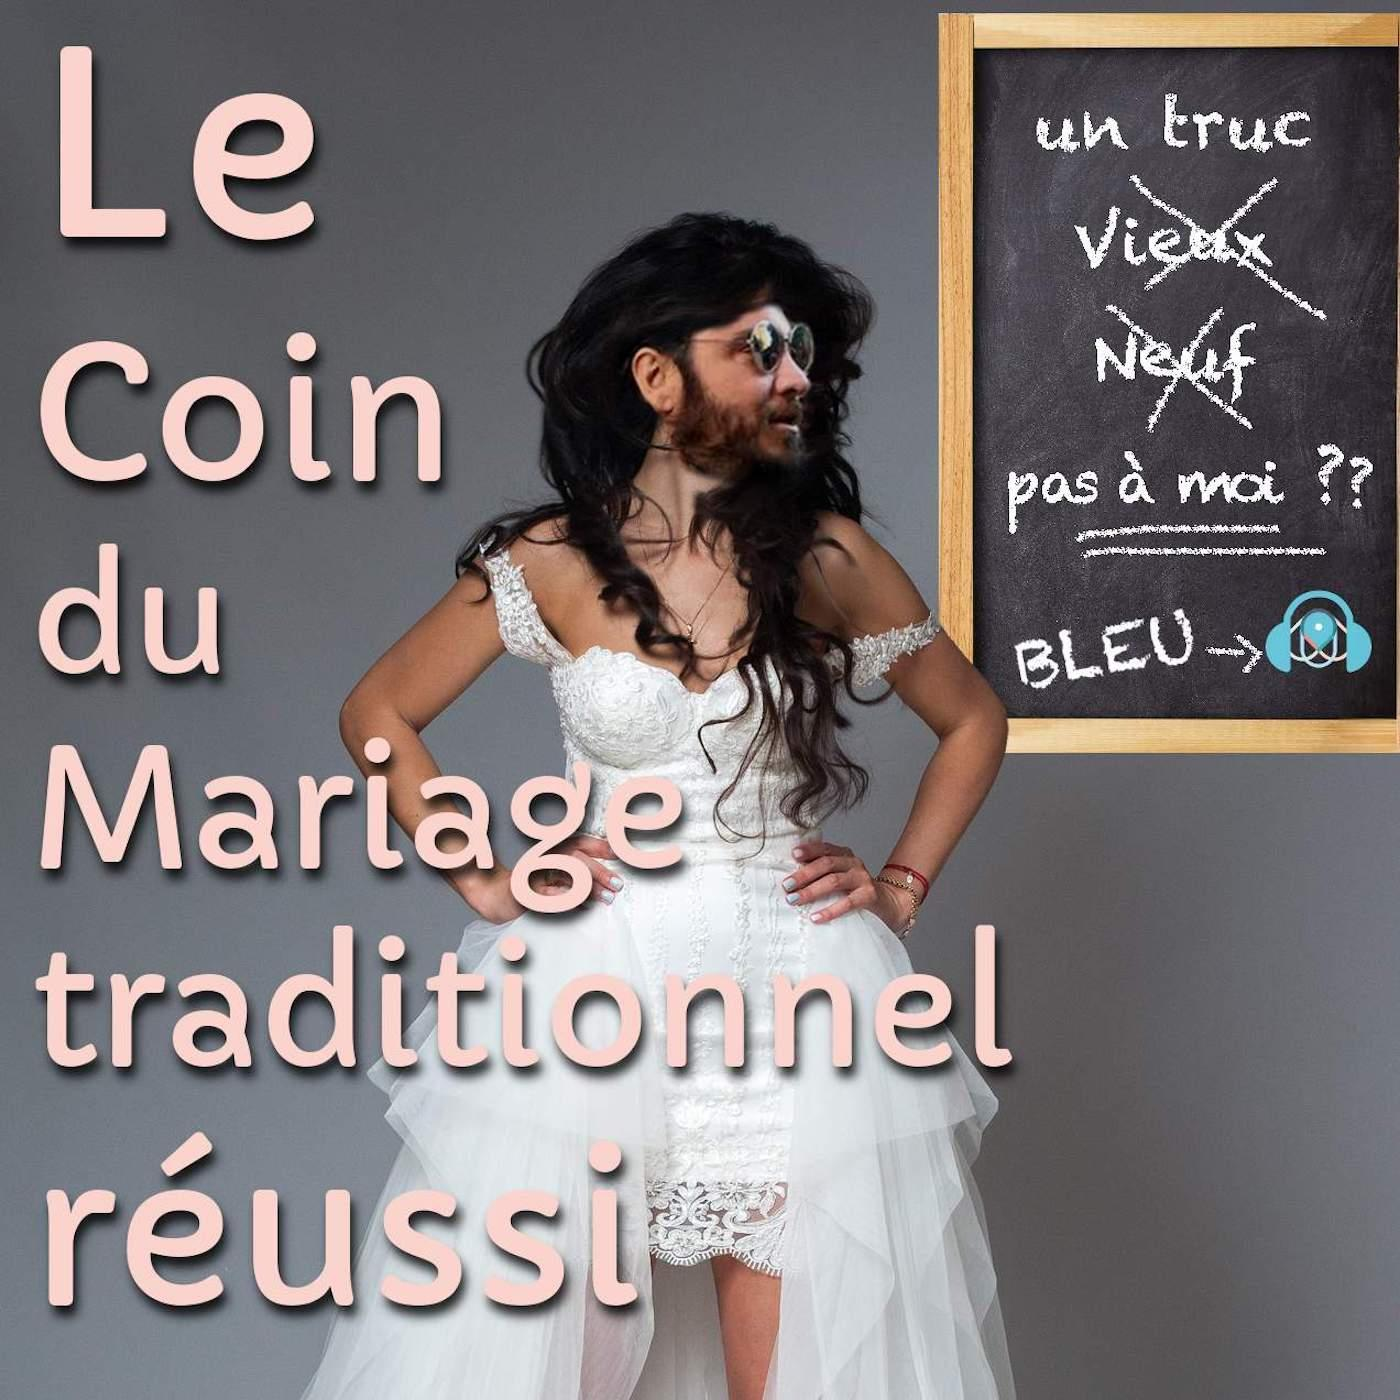 LE COIN DU MARIAGE TRADITIONNEL RÉUSSI S1E26 - Traditionaliste